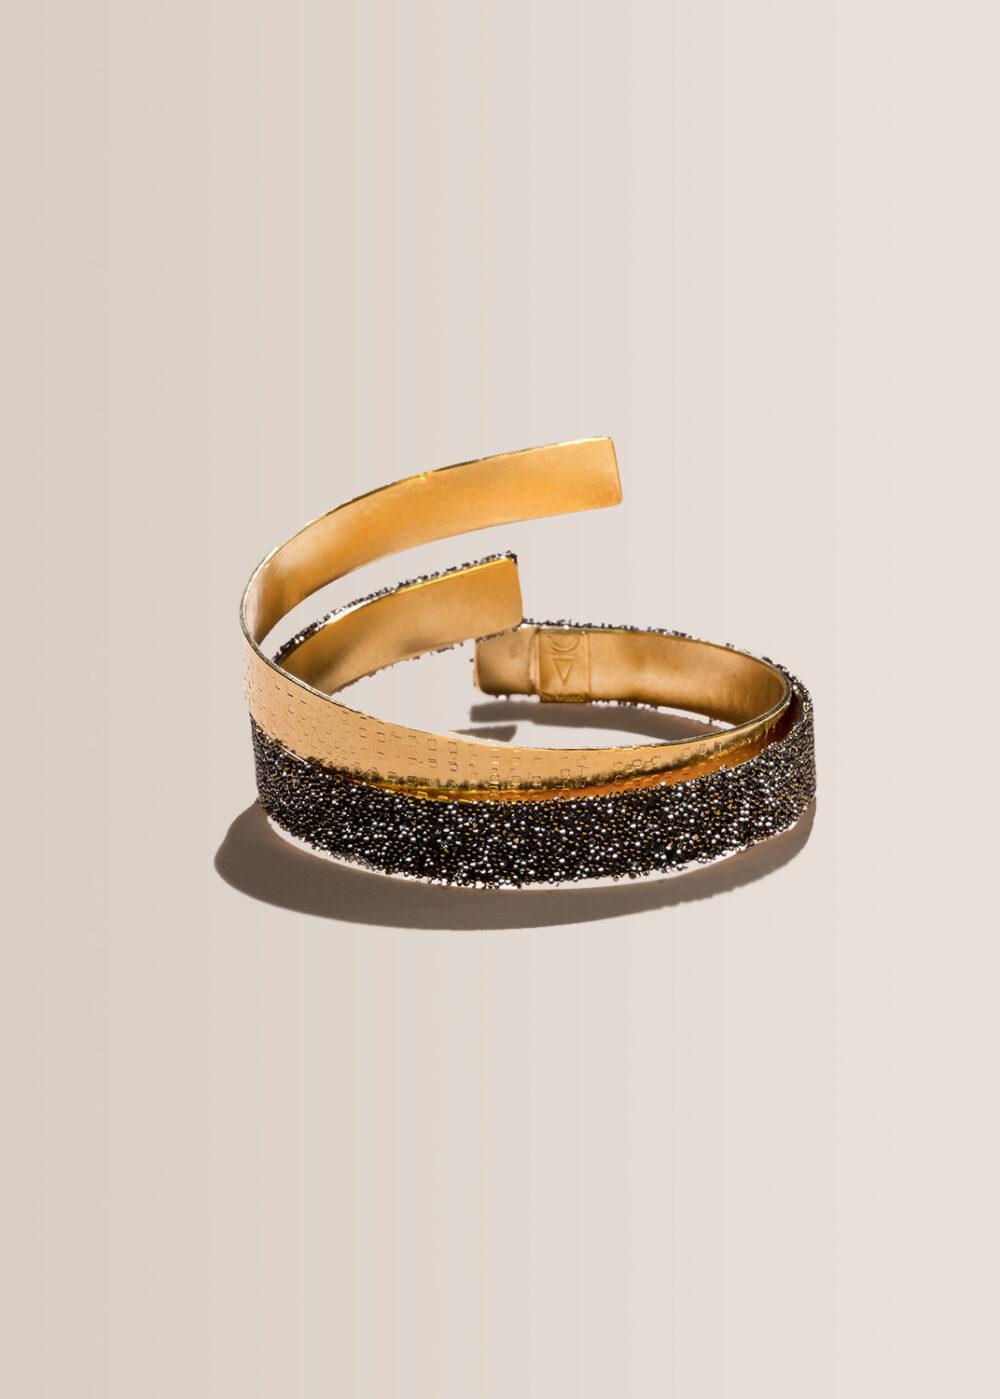 Helena-Armreif-gold-gehaemmert-svarowski-schwarz